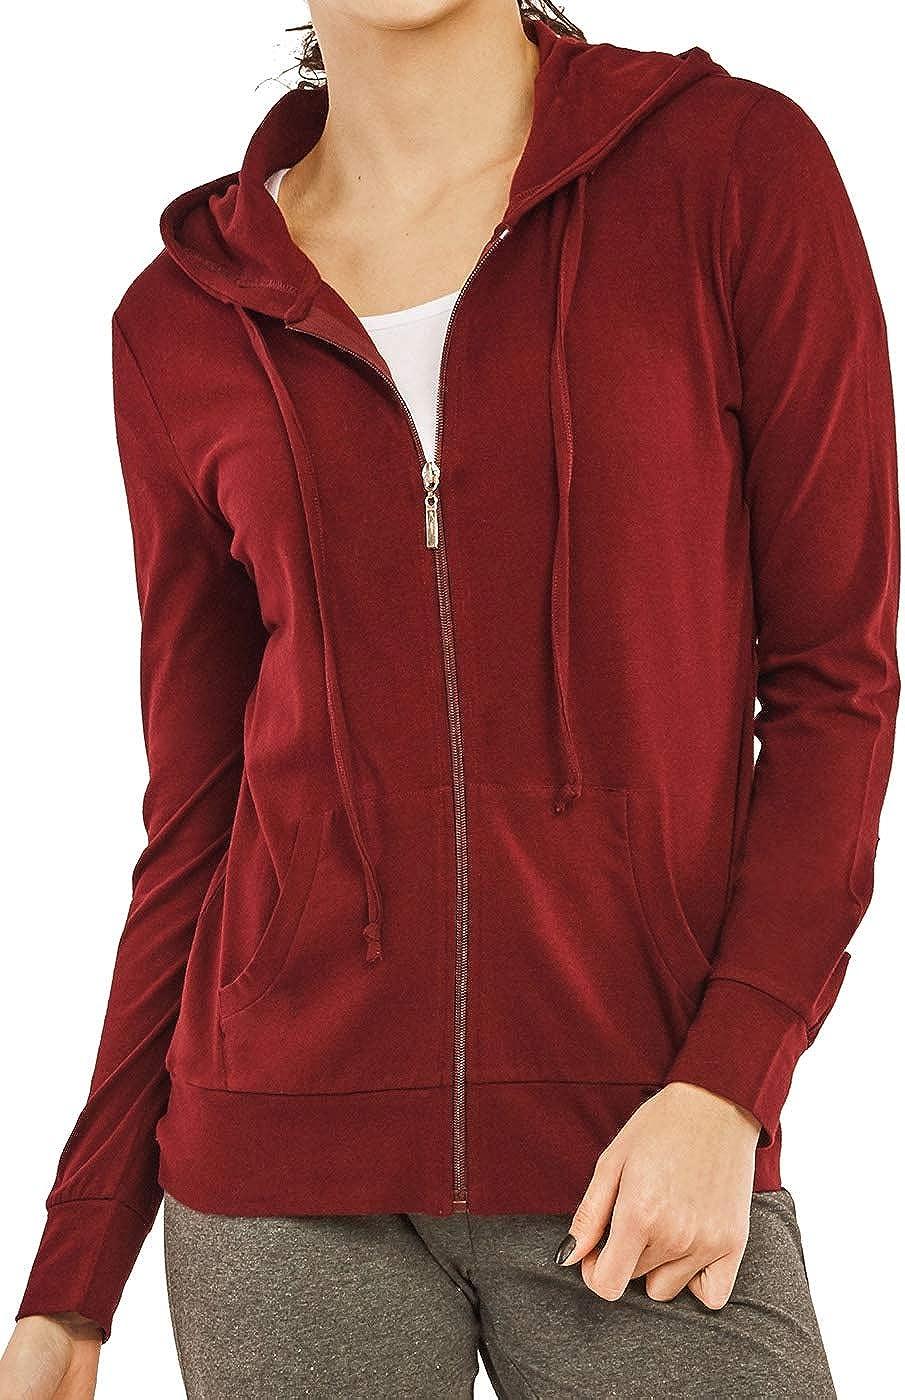 Women's Thin Lightweight Cotton Long Sleeve Hoodie